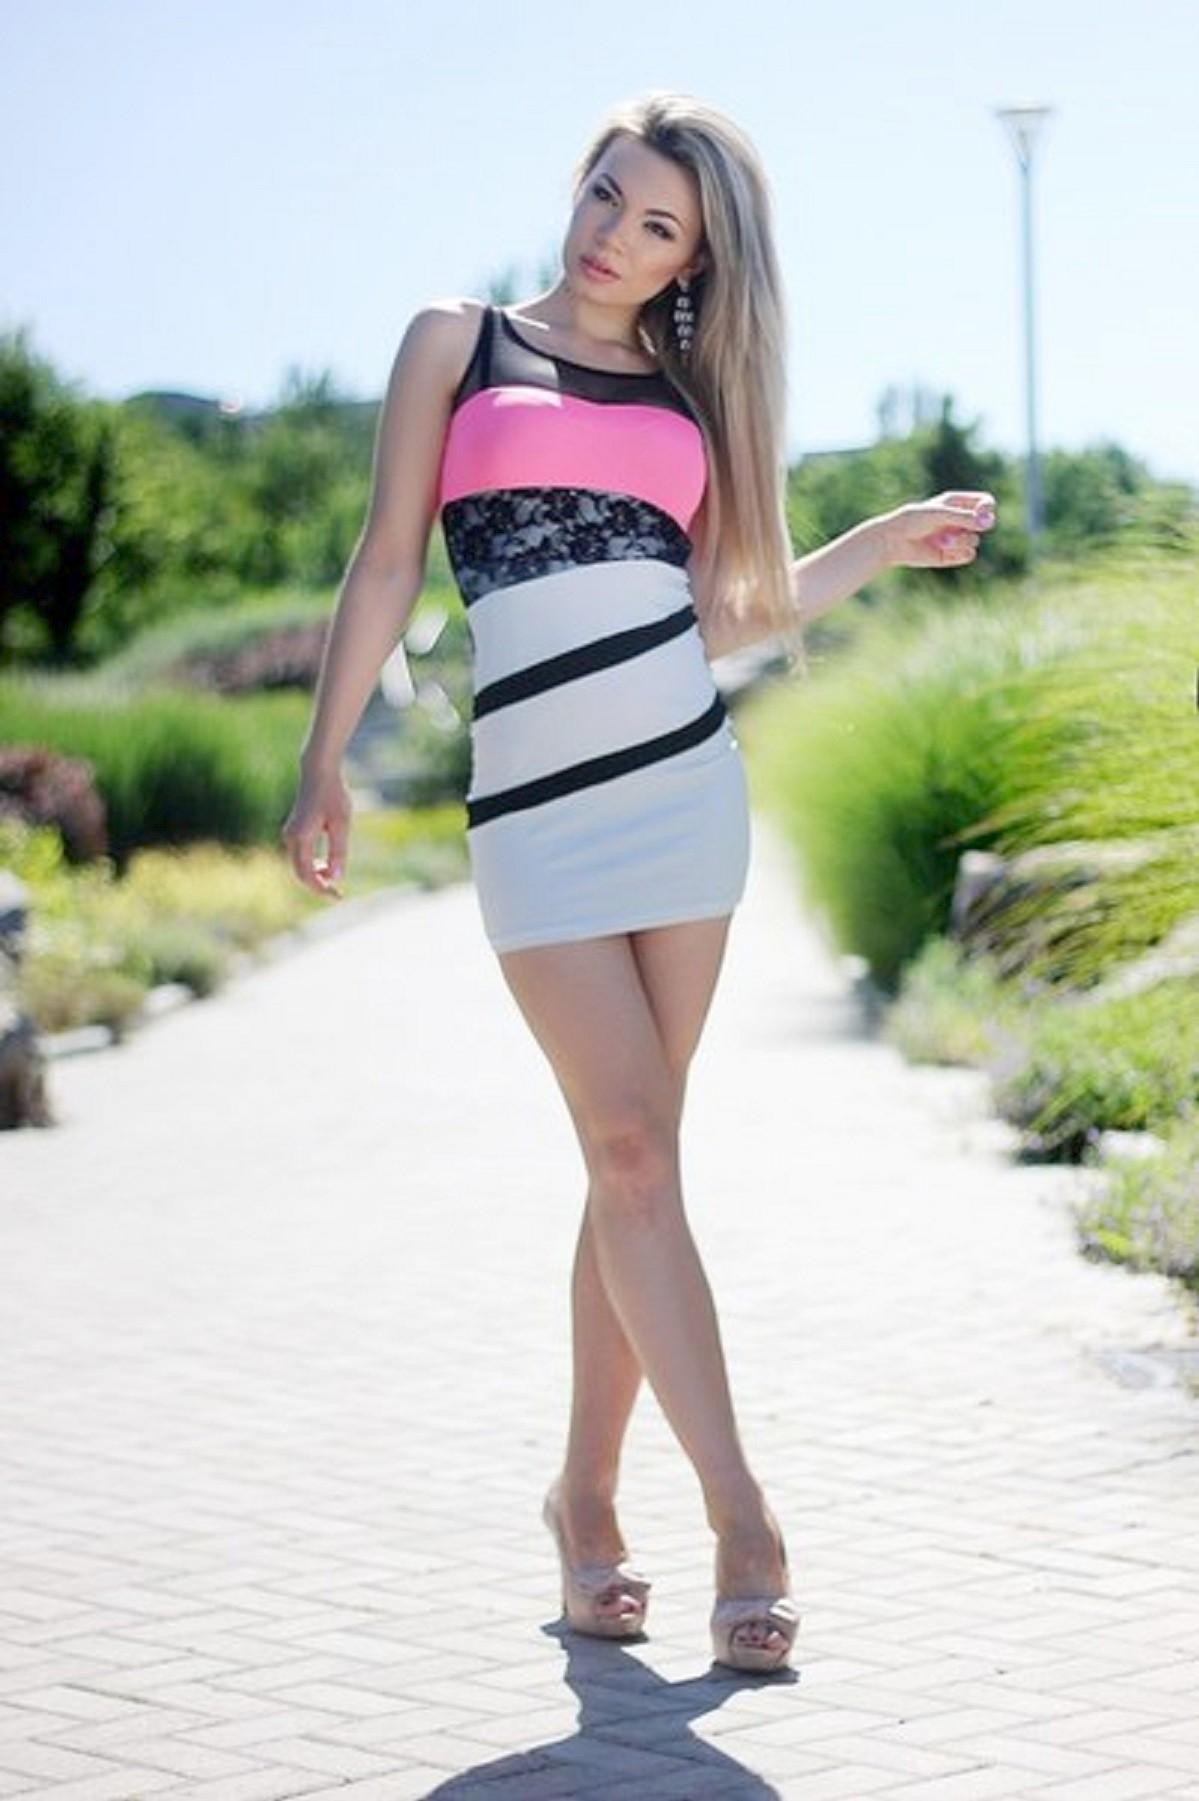 marina single girls Ukraine women 8k likes ukrainian women for marriage meet single girls for dating, or marriage tips on dating ukrainian girls millions of profiles.